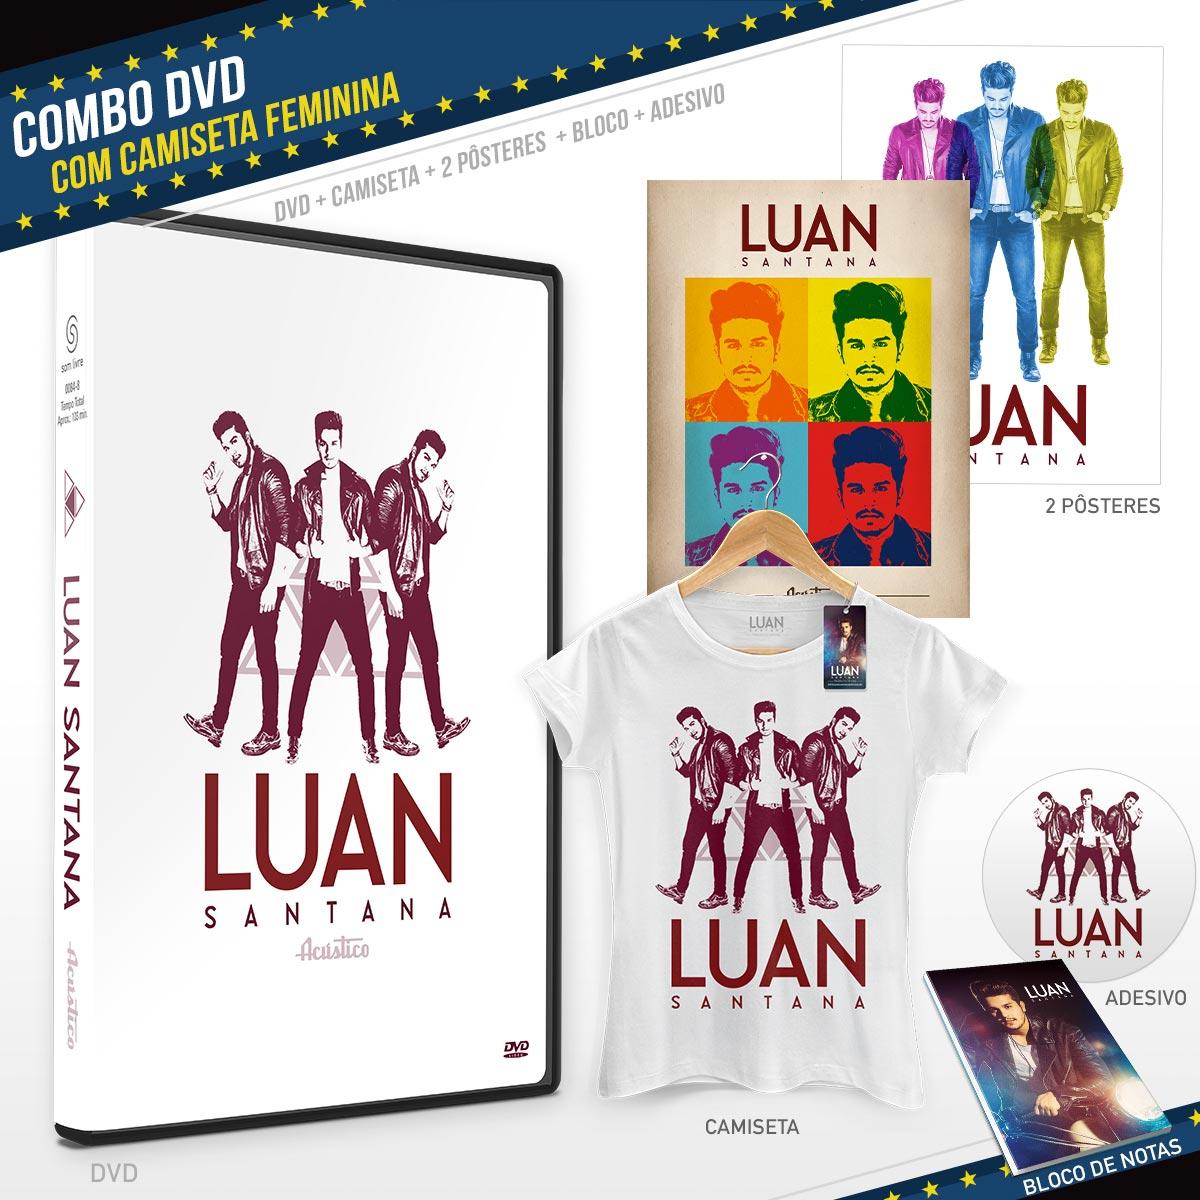 Combo DVD Luan Santana Acústico + Camiseta